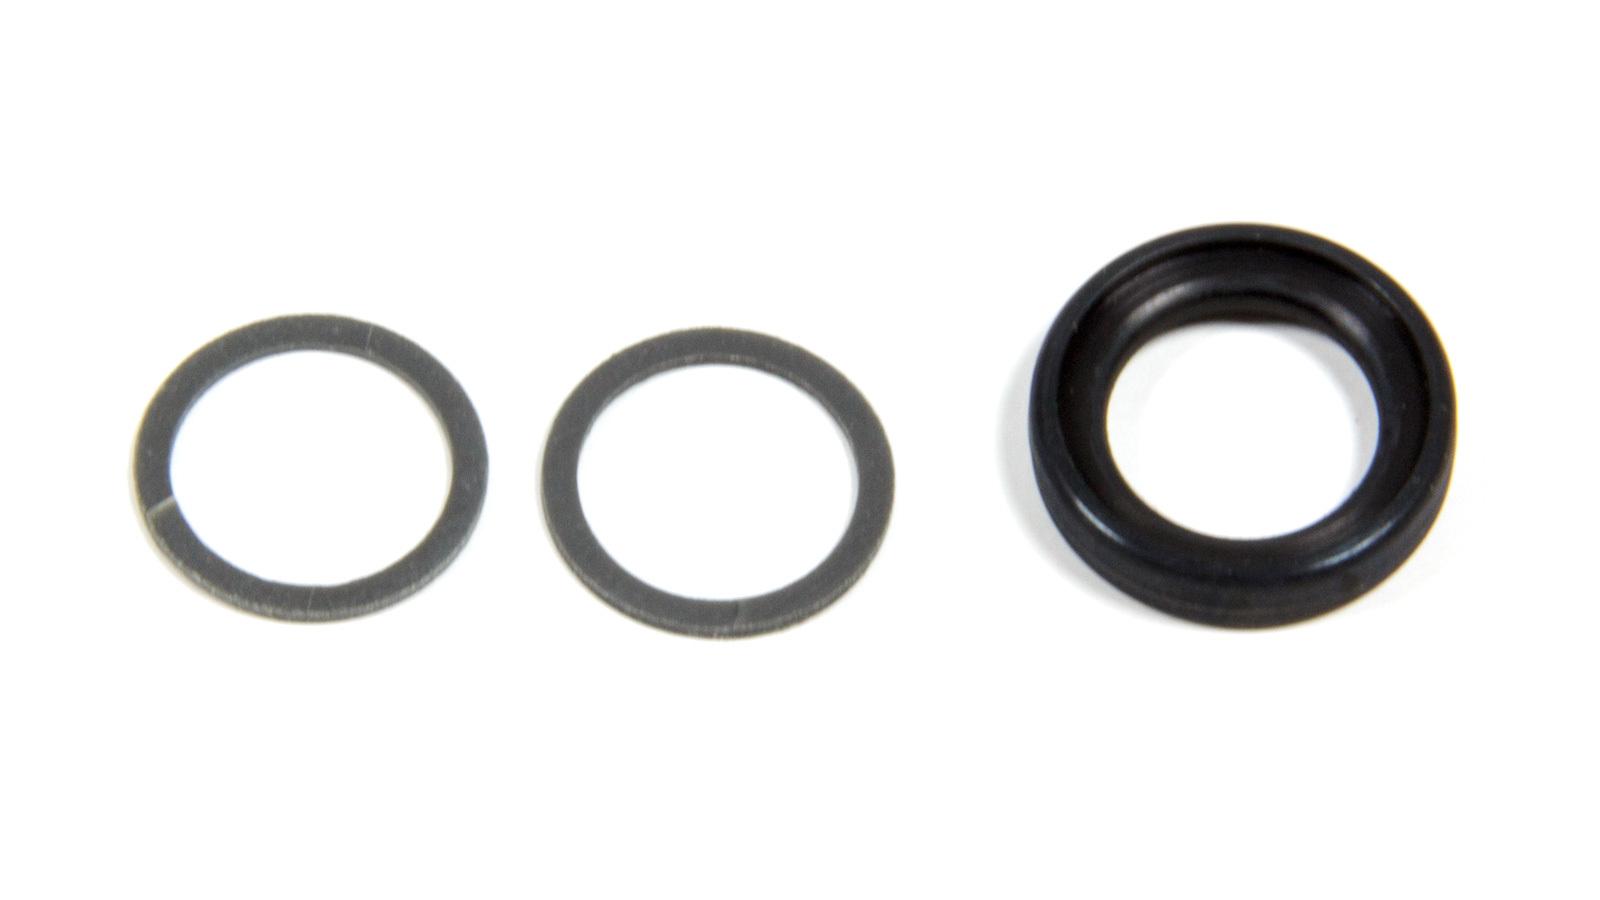 Integra Shocks 310-30281 O-Ring, Rubber, T-Seal, 1/2 in Rod, Integra 401 / 41 / 45 / 46 / 47 / 404 / 405 / 406 / 604 Series Shocks, Each